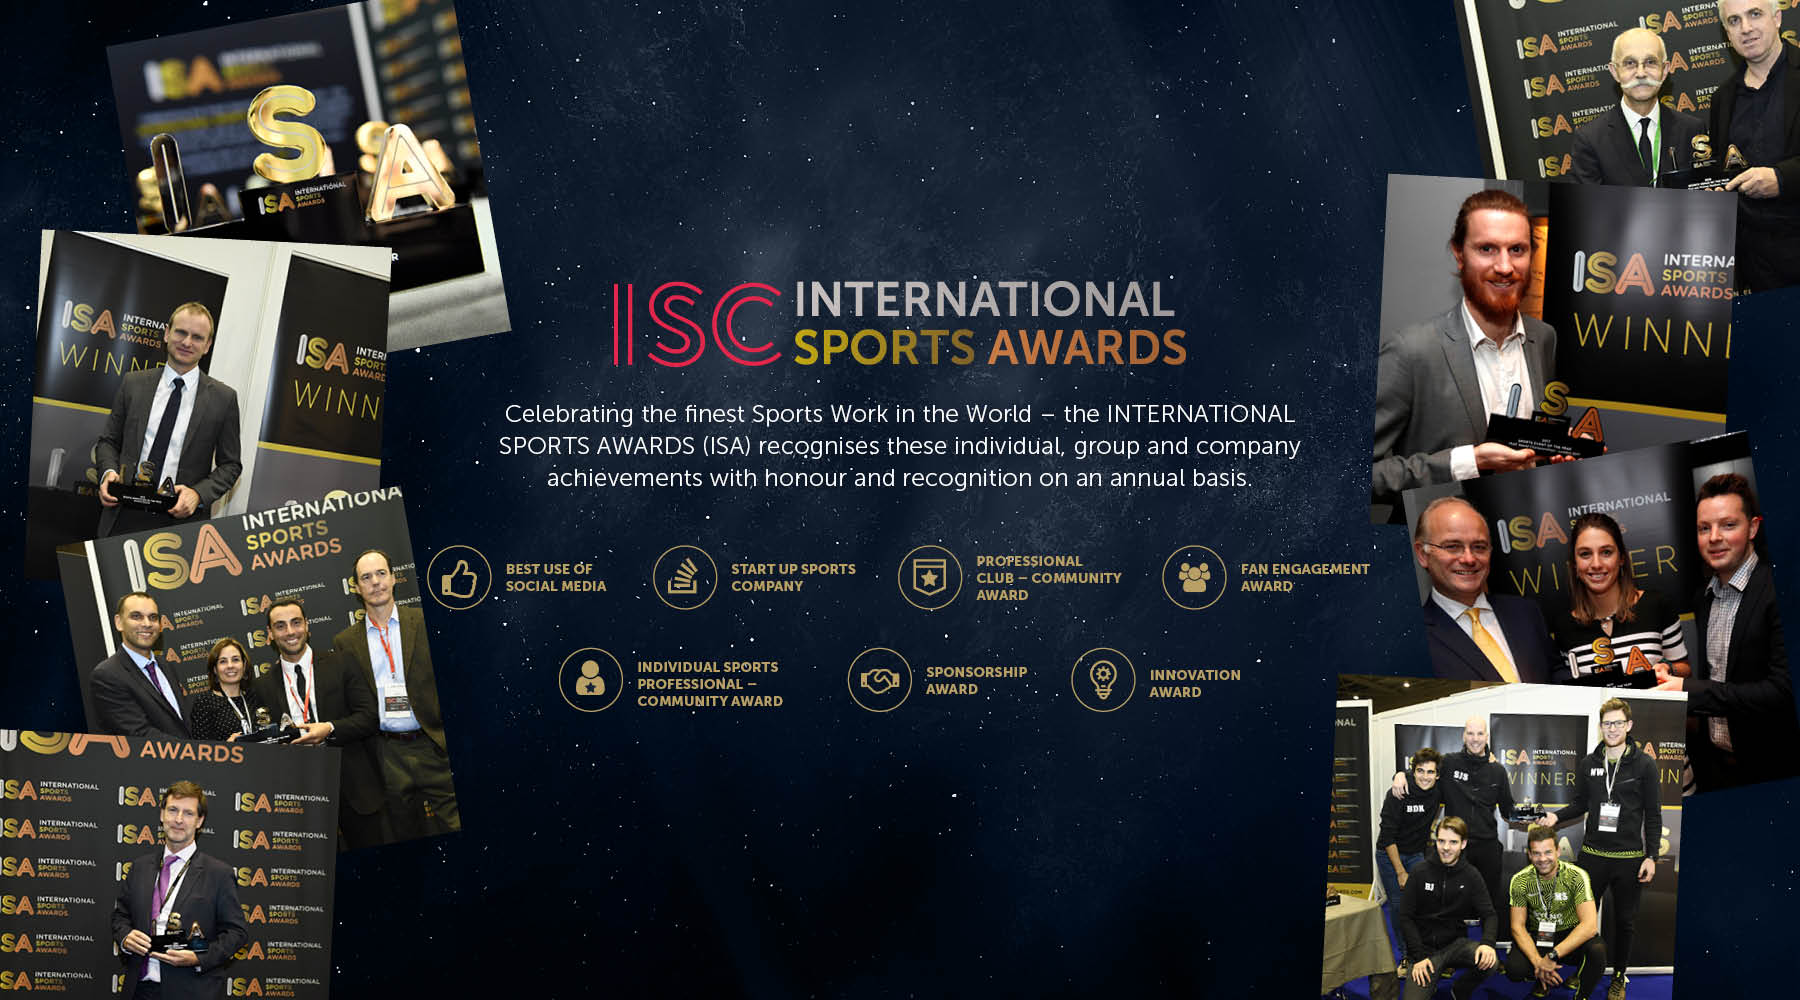 ISC International Sports Awards